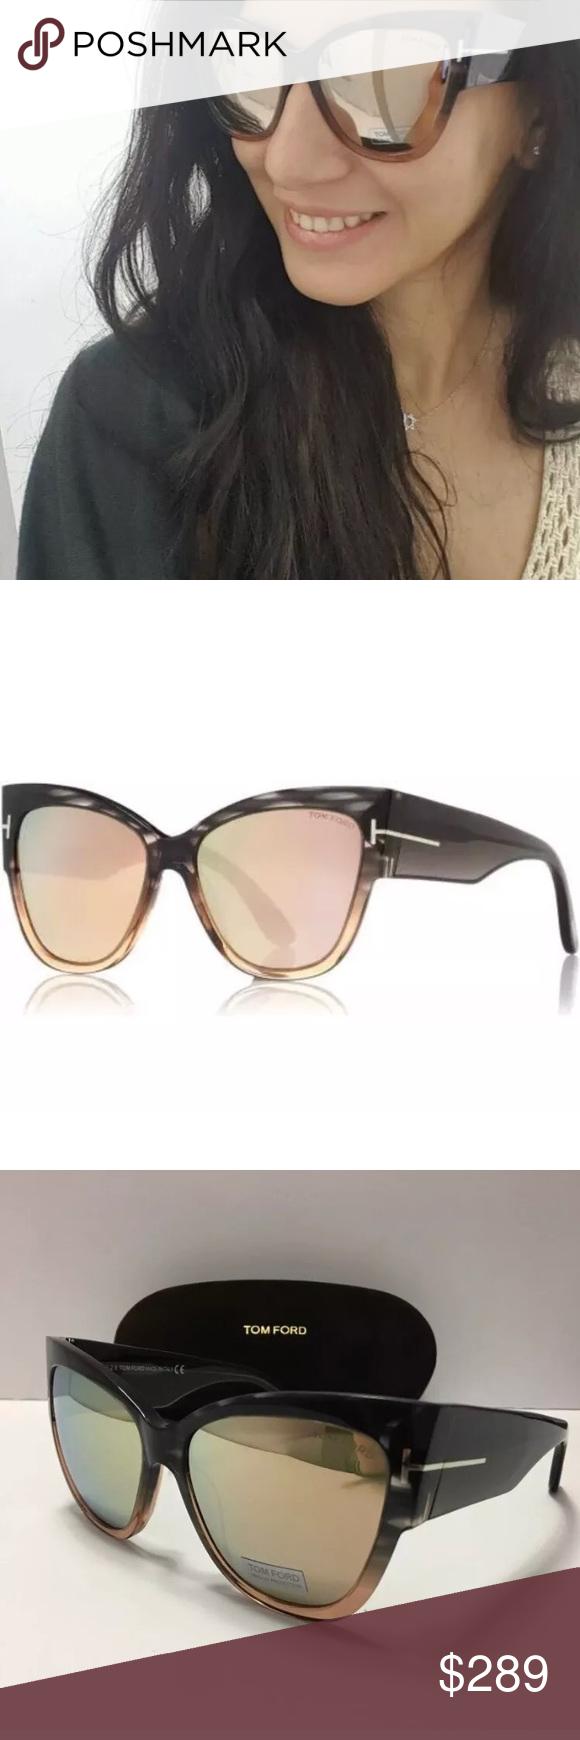 3acb88b7afa Tom Ford TF 371 Anoushka Mirror Sunglasses Cateye Regular Retail   420. Tom  Ford TF